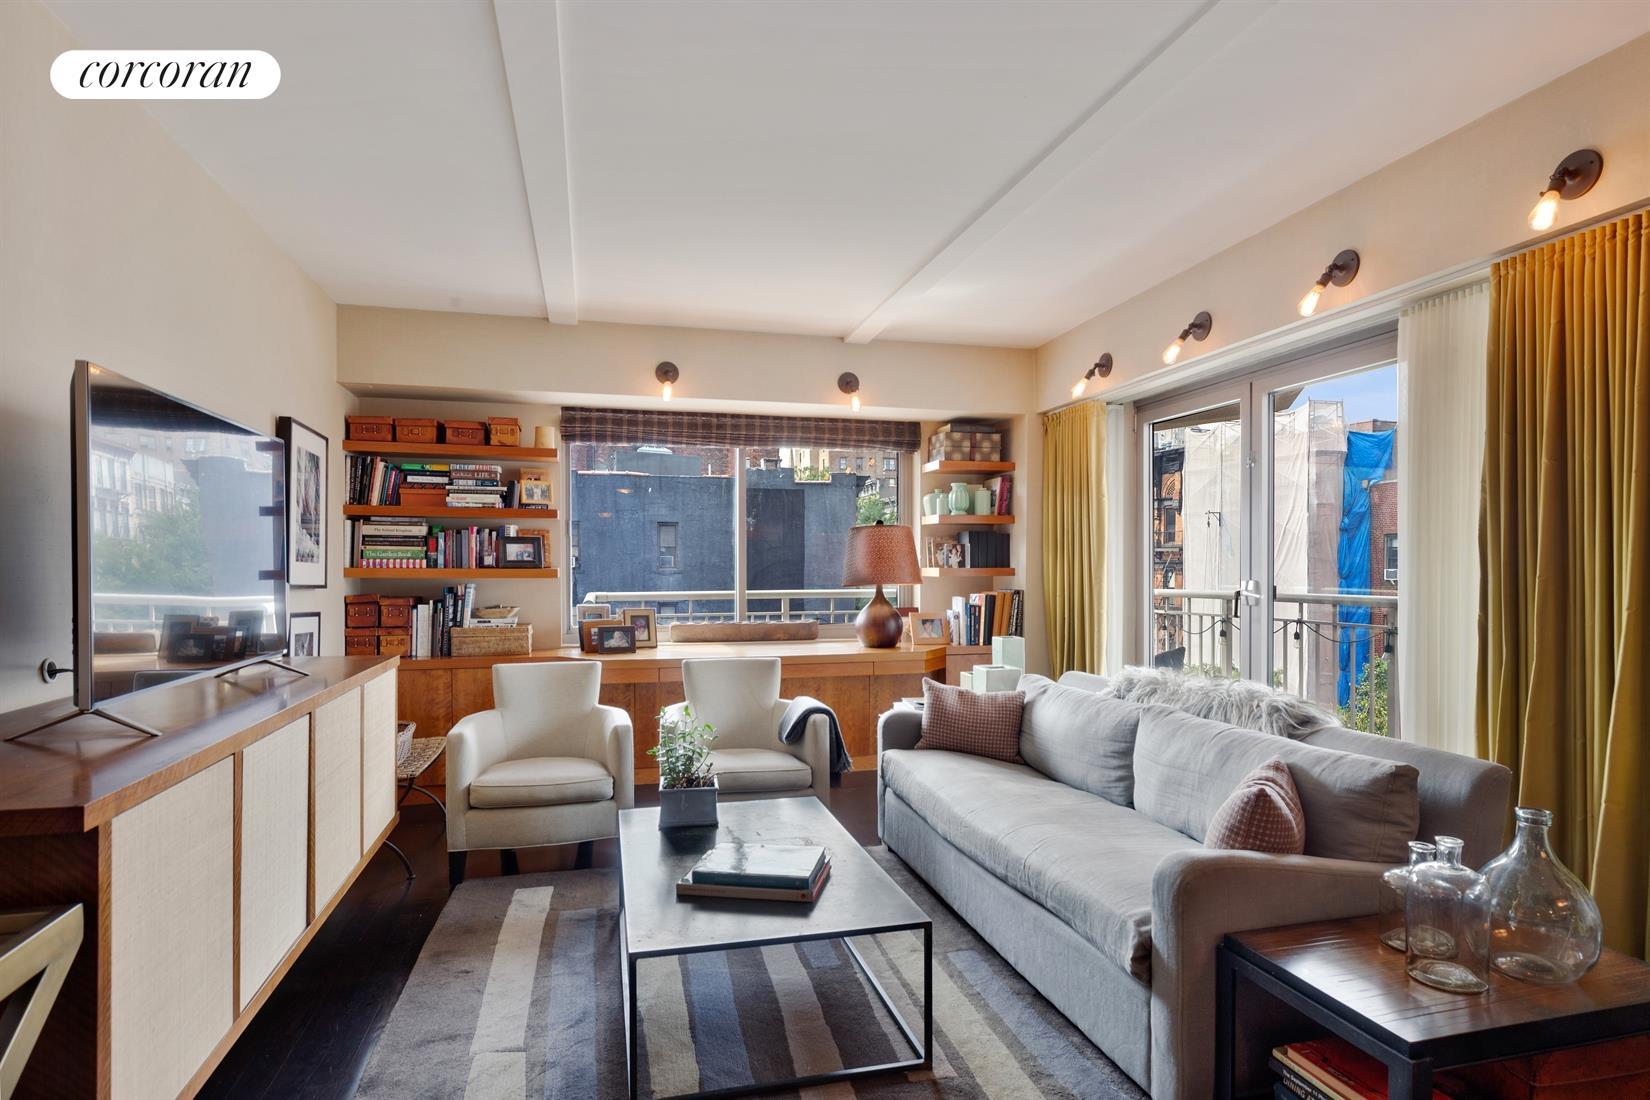 240 East 10th Street, Apt 5c, Manhattan, New York 10003